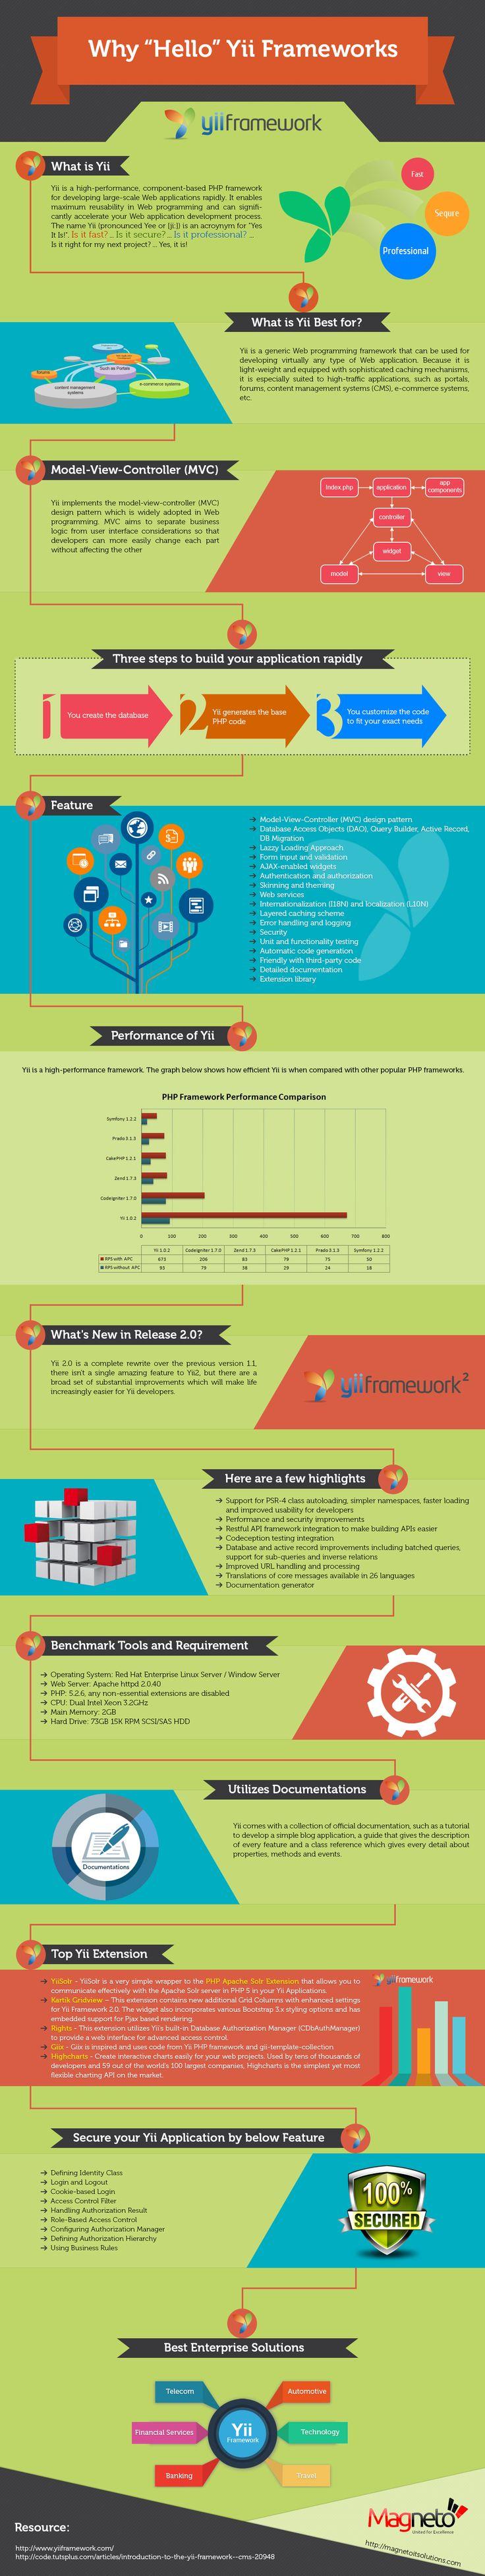 importance of web application development